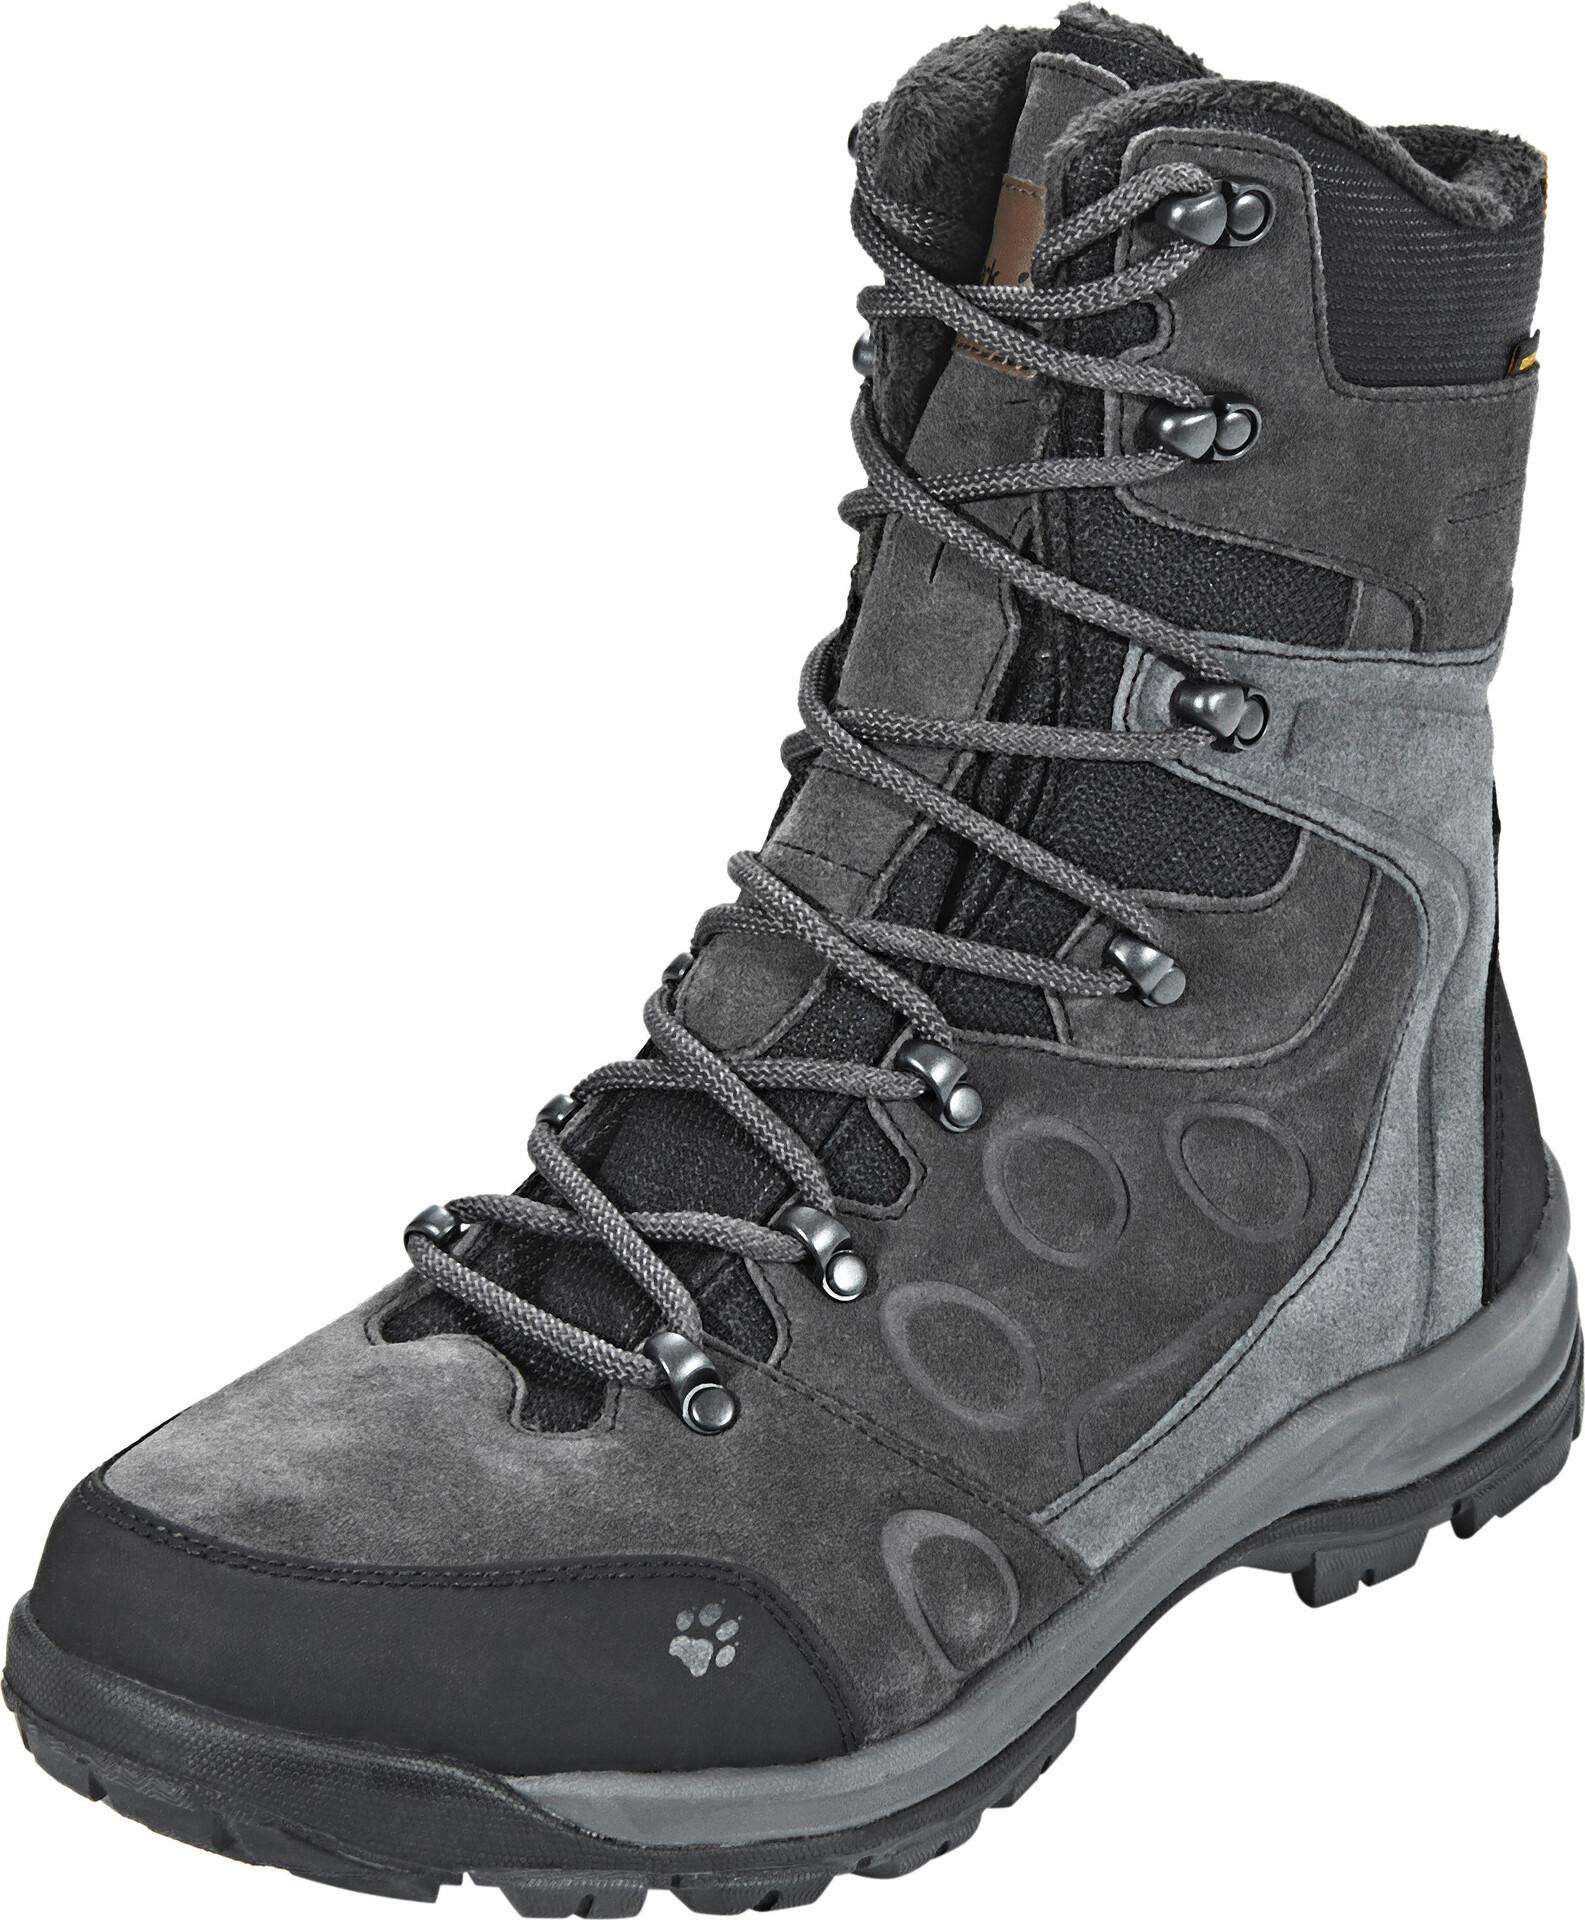 Jack Wolfskin Glacier Bay Texapore High Shoes Men phantom